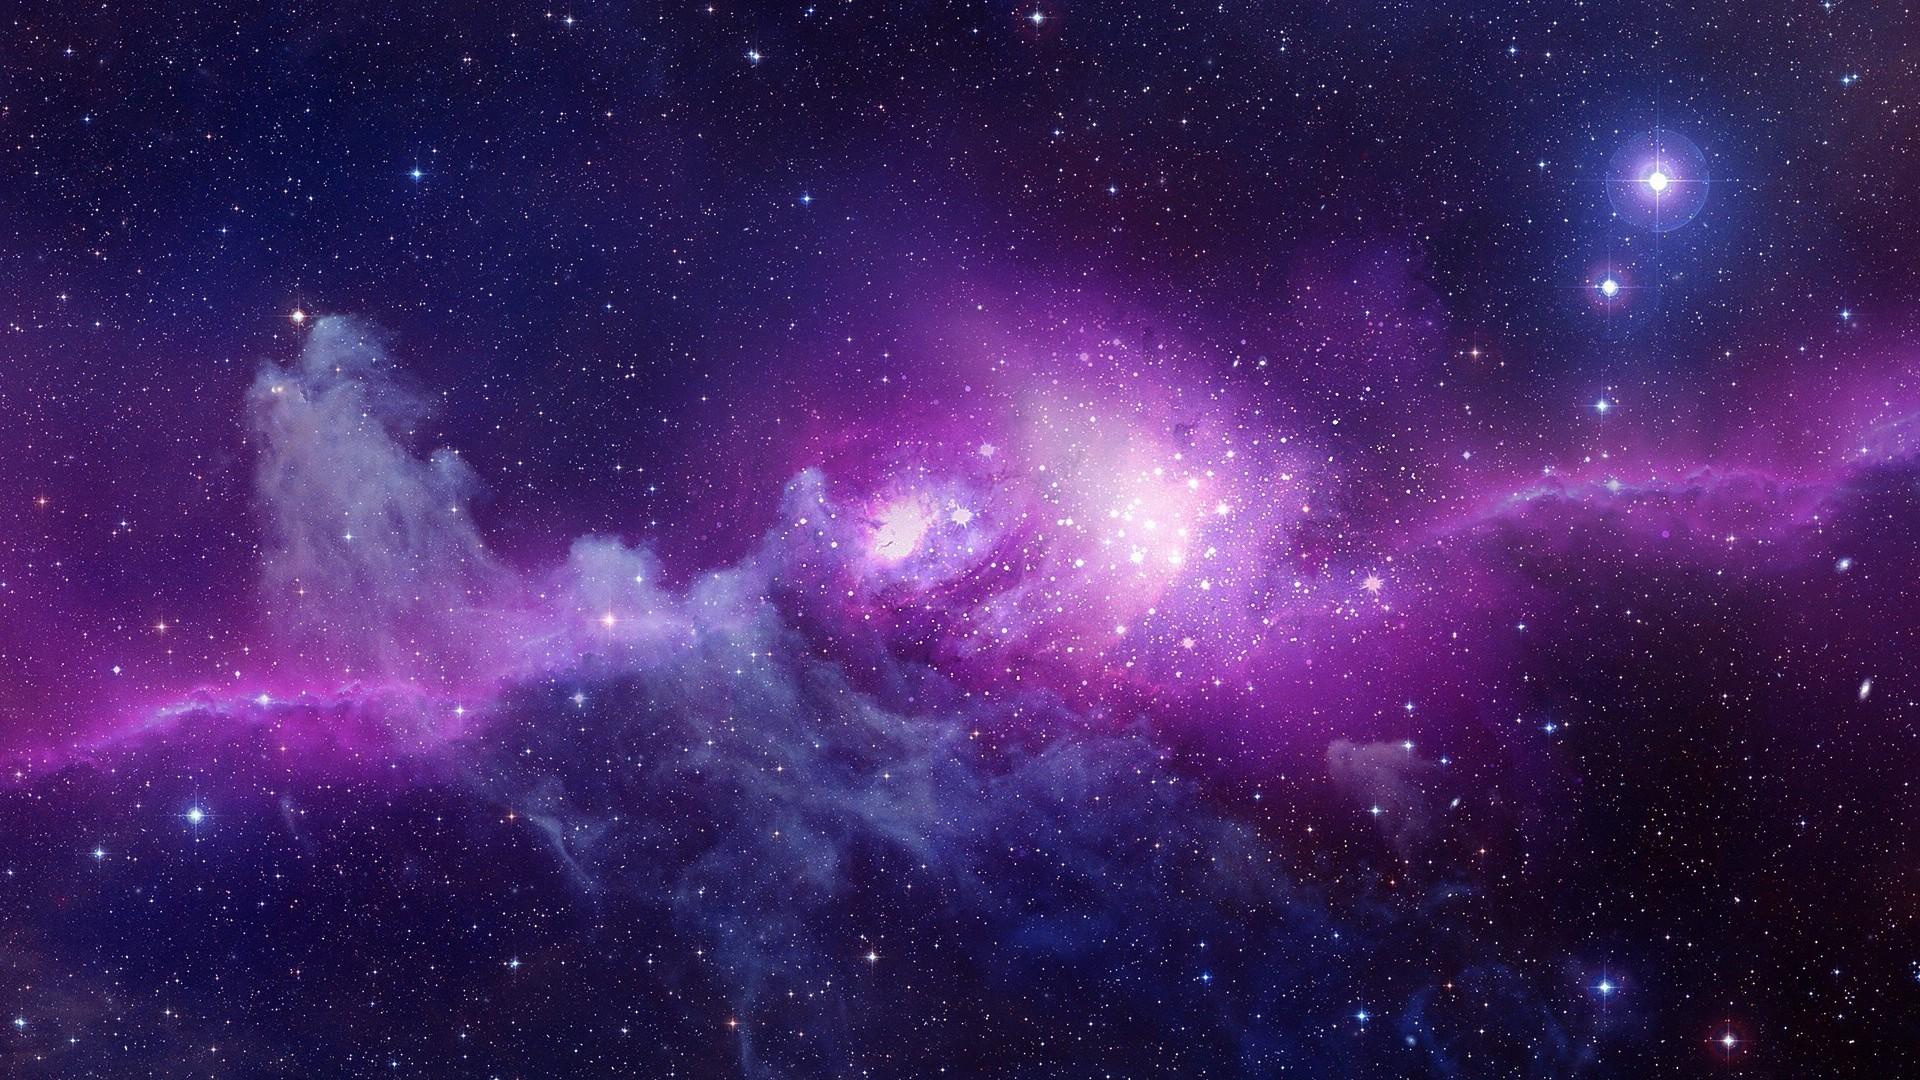 44 Hd Purple Space Wallpaper On Wallpapersafari